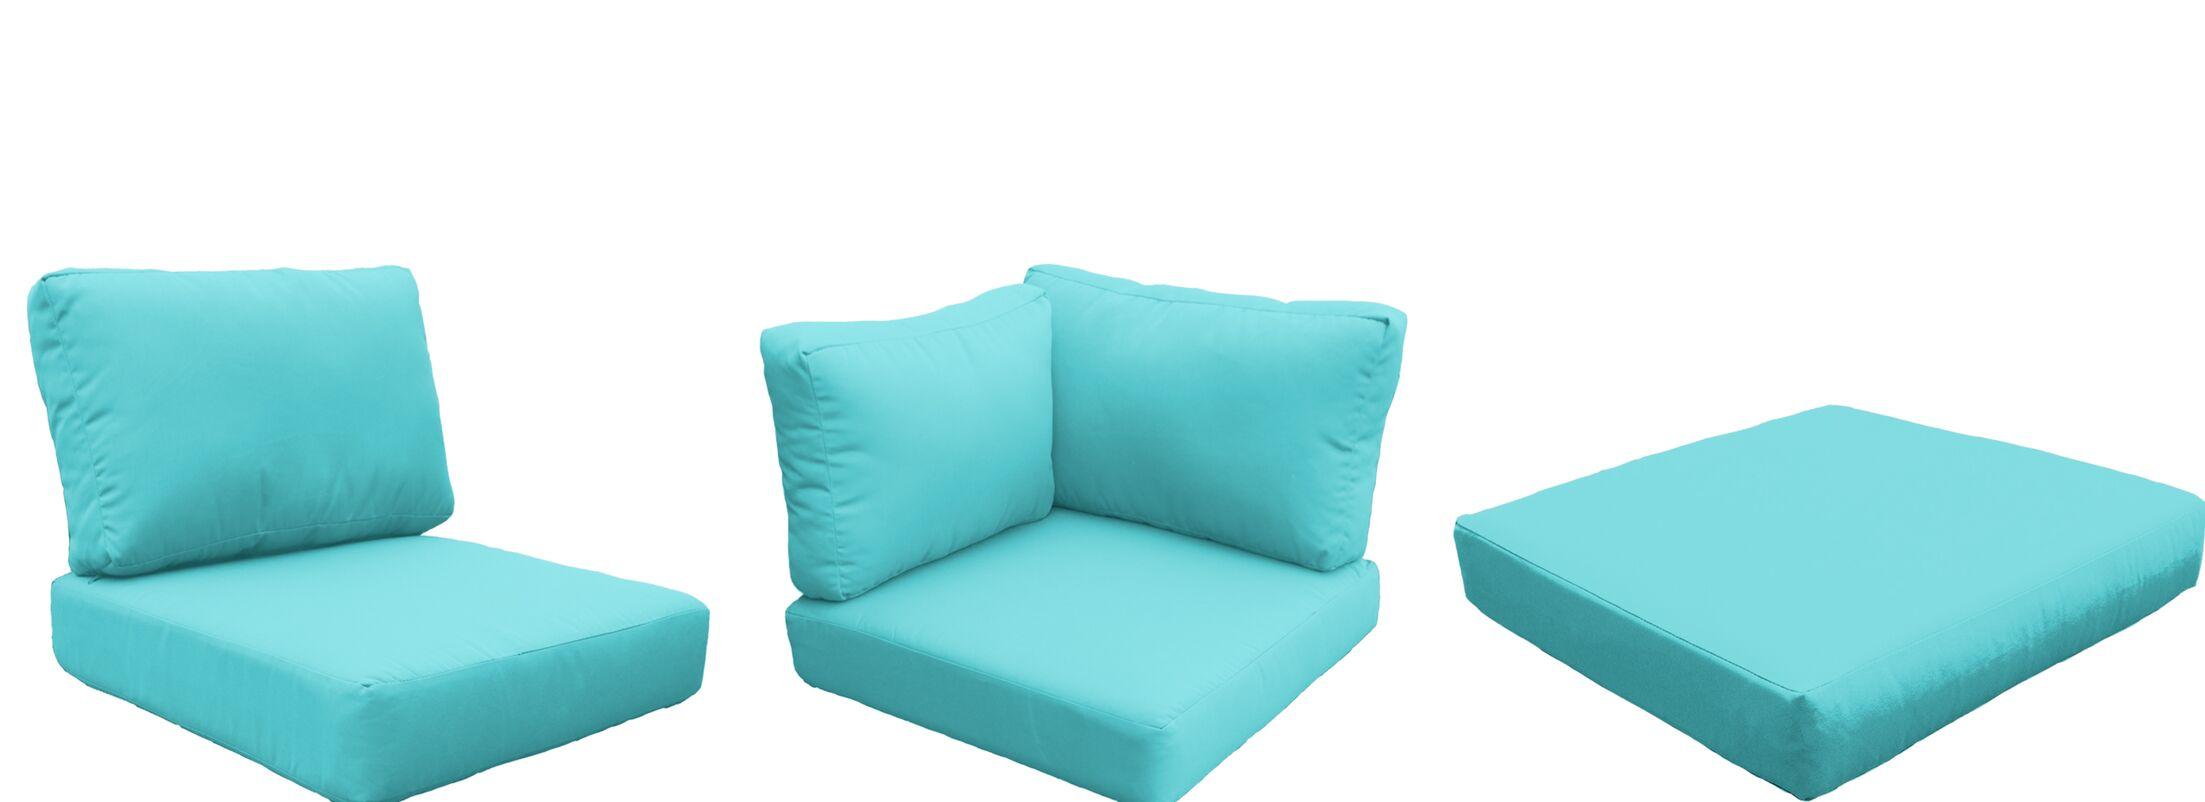 Florence 9 Piece Outdoor Cushion Set Fabric: Aruba